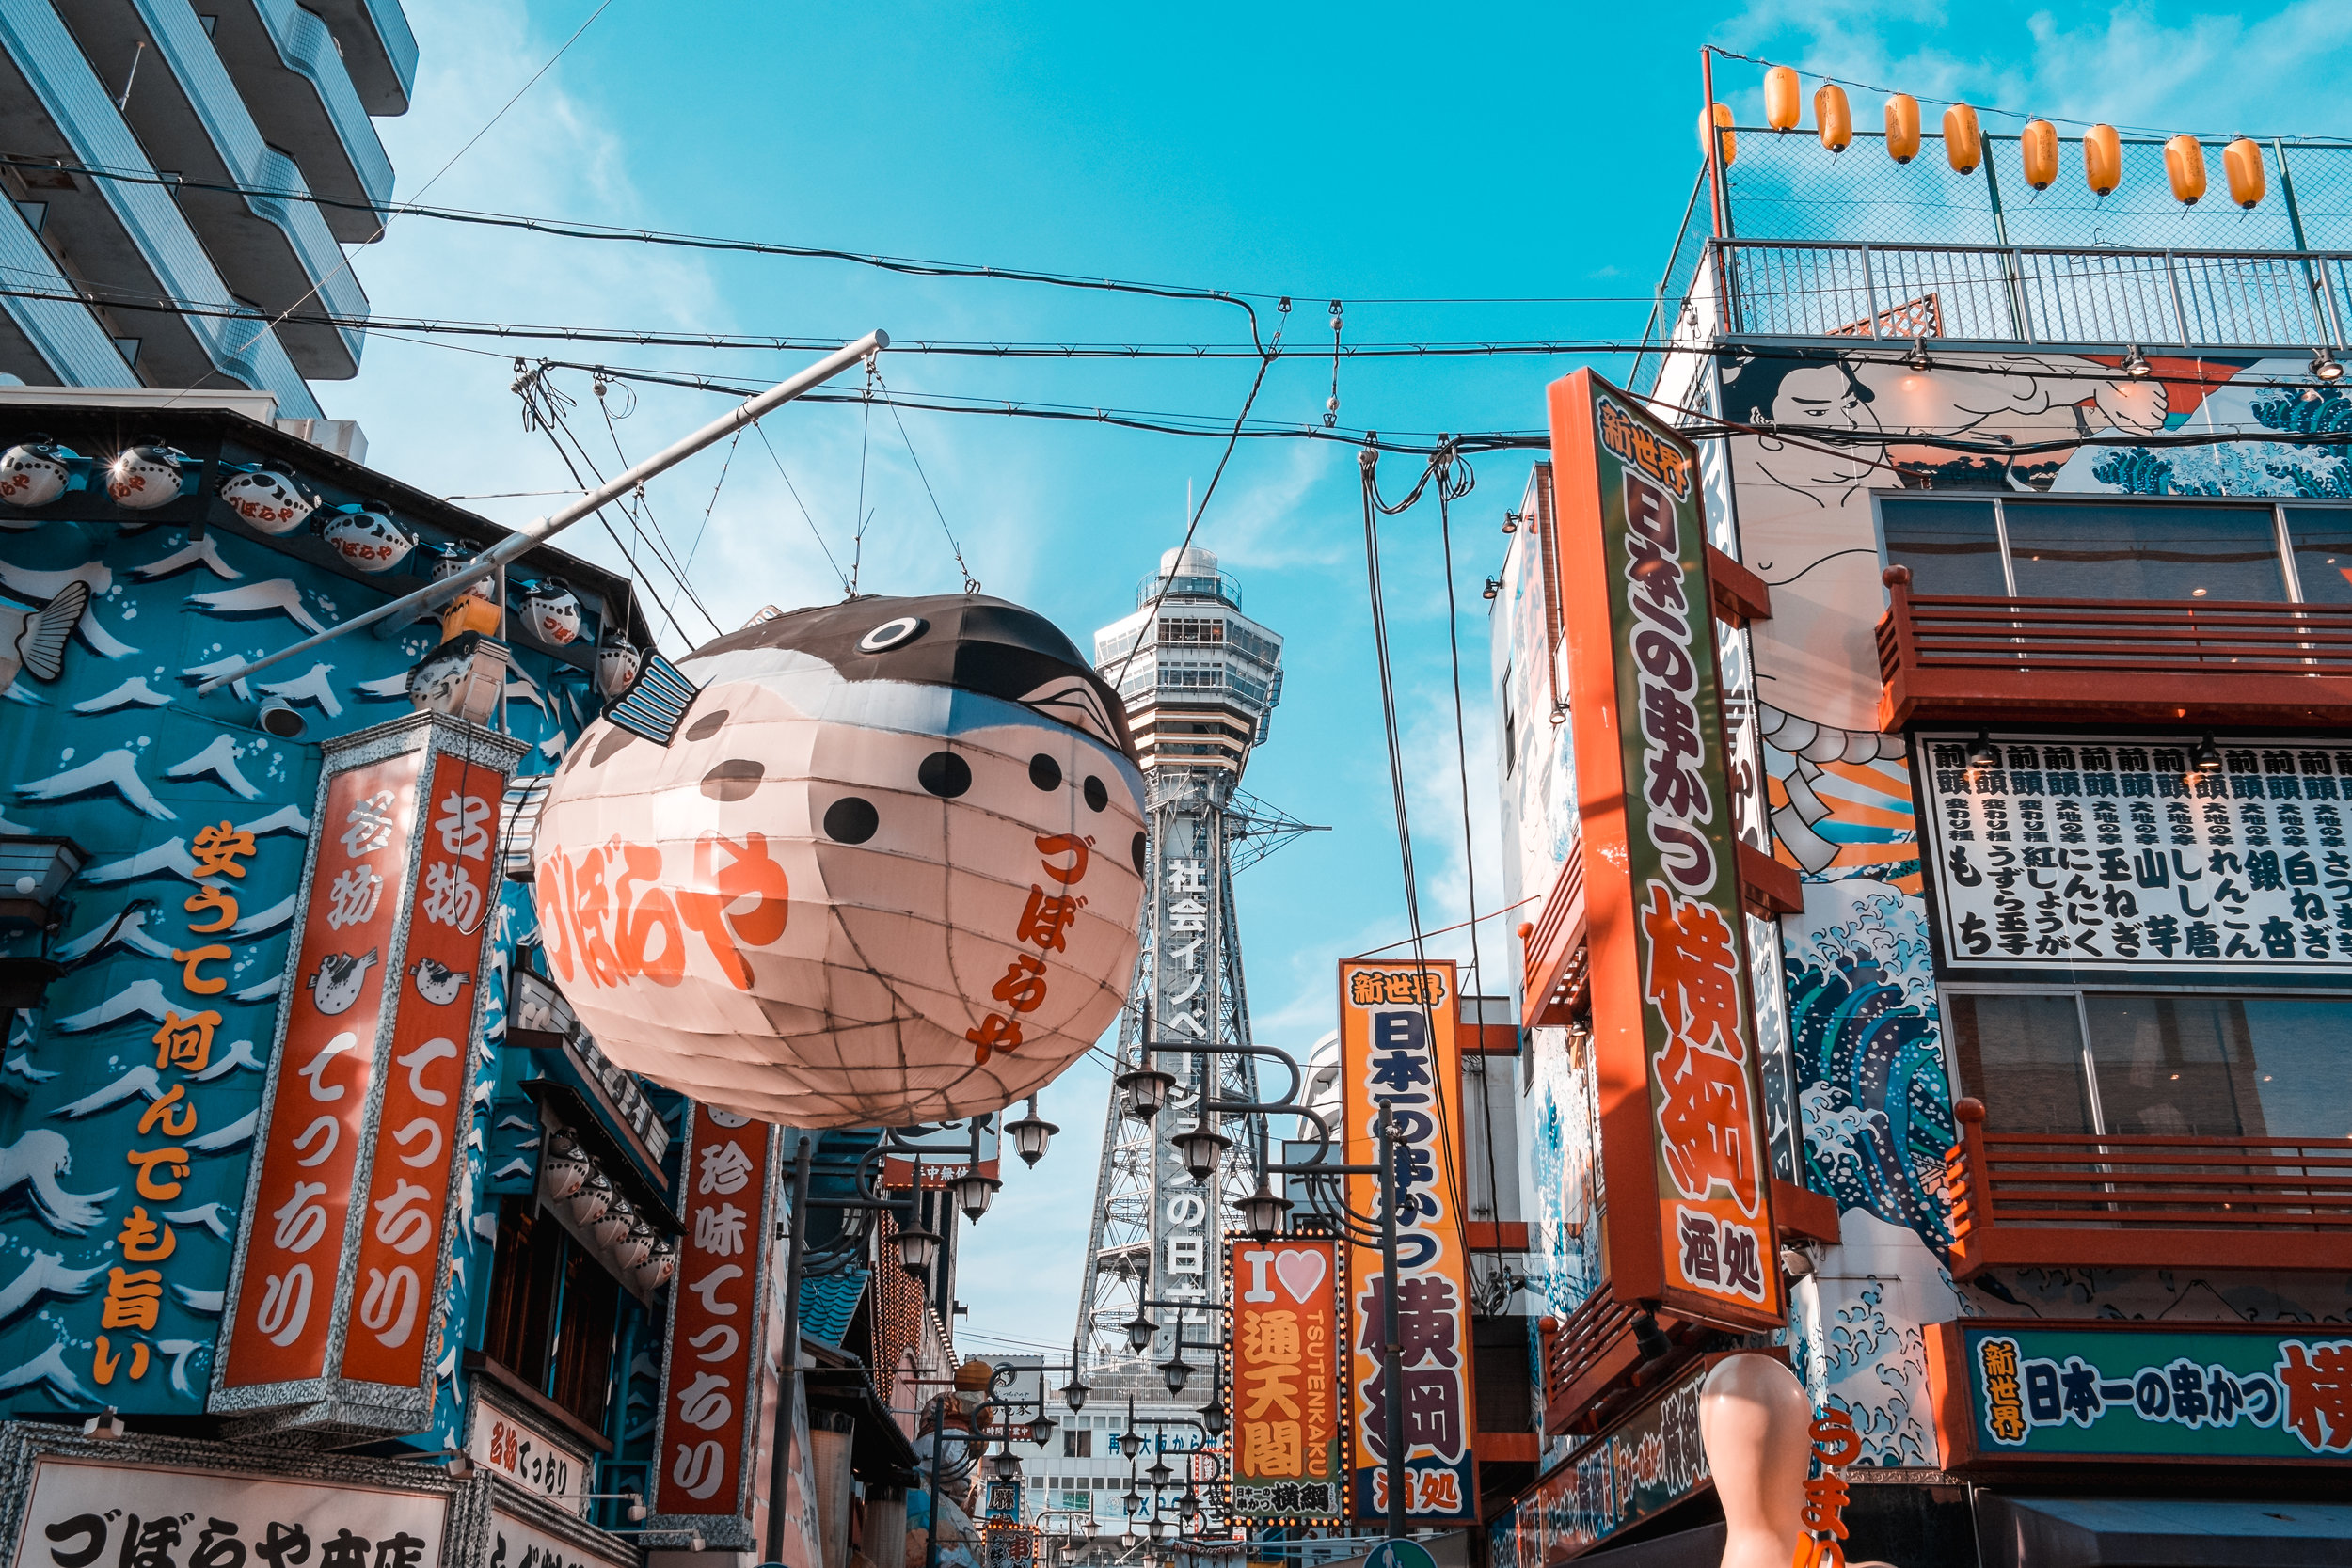 KyotoJapan_2018_AdamDillon_DSCF9934.jpg